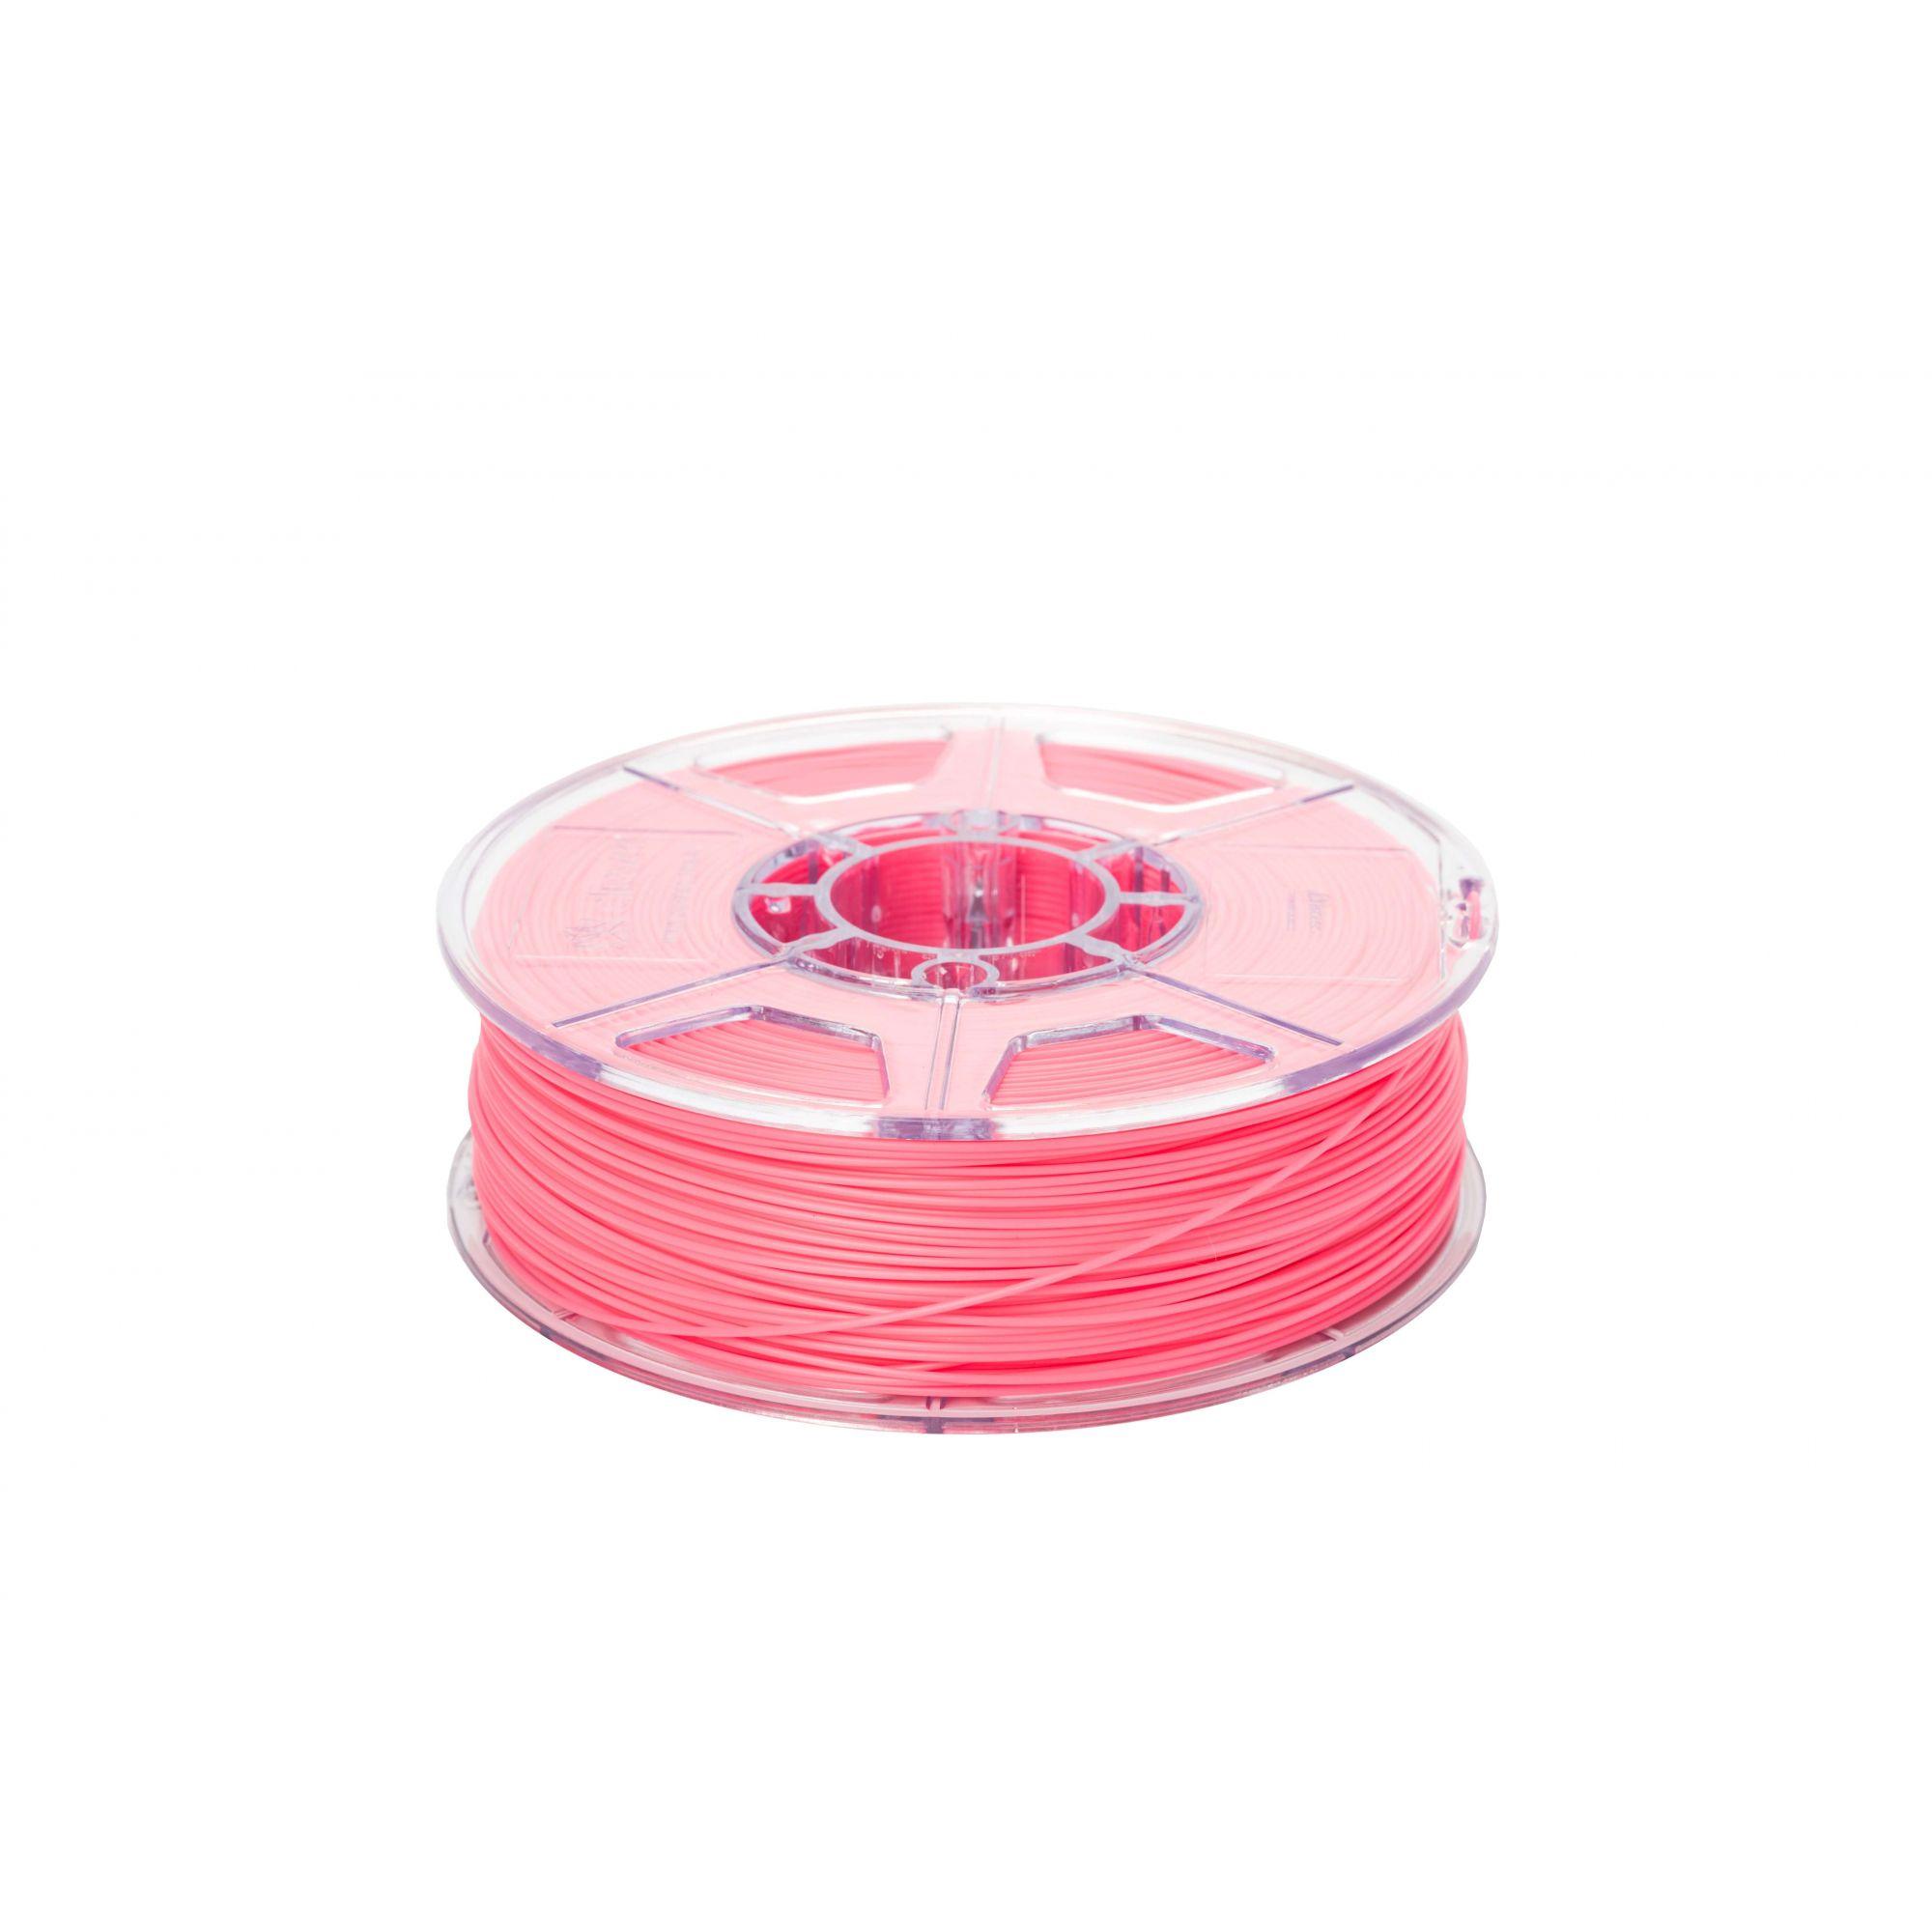 Filamento PLA - Rosa Claro - Cliever - 1.75mm - 1kg